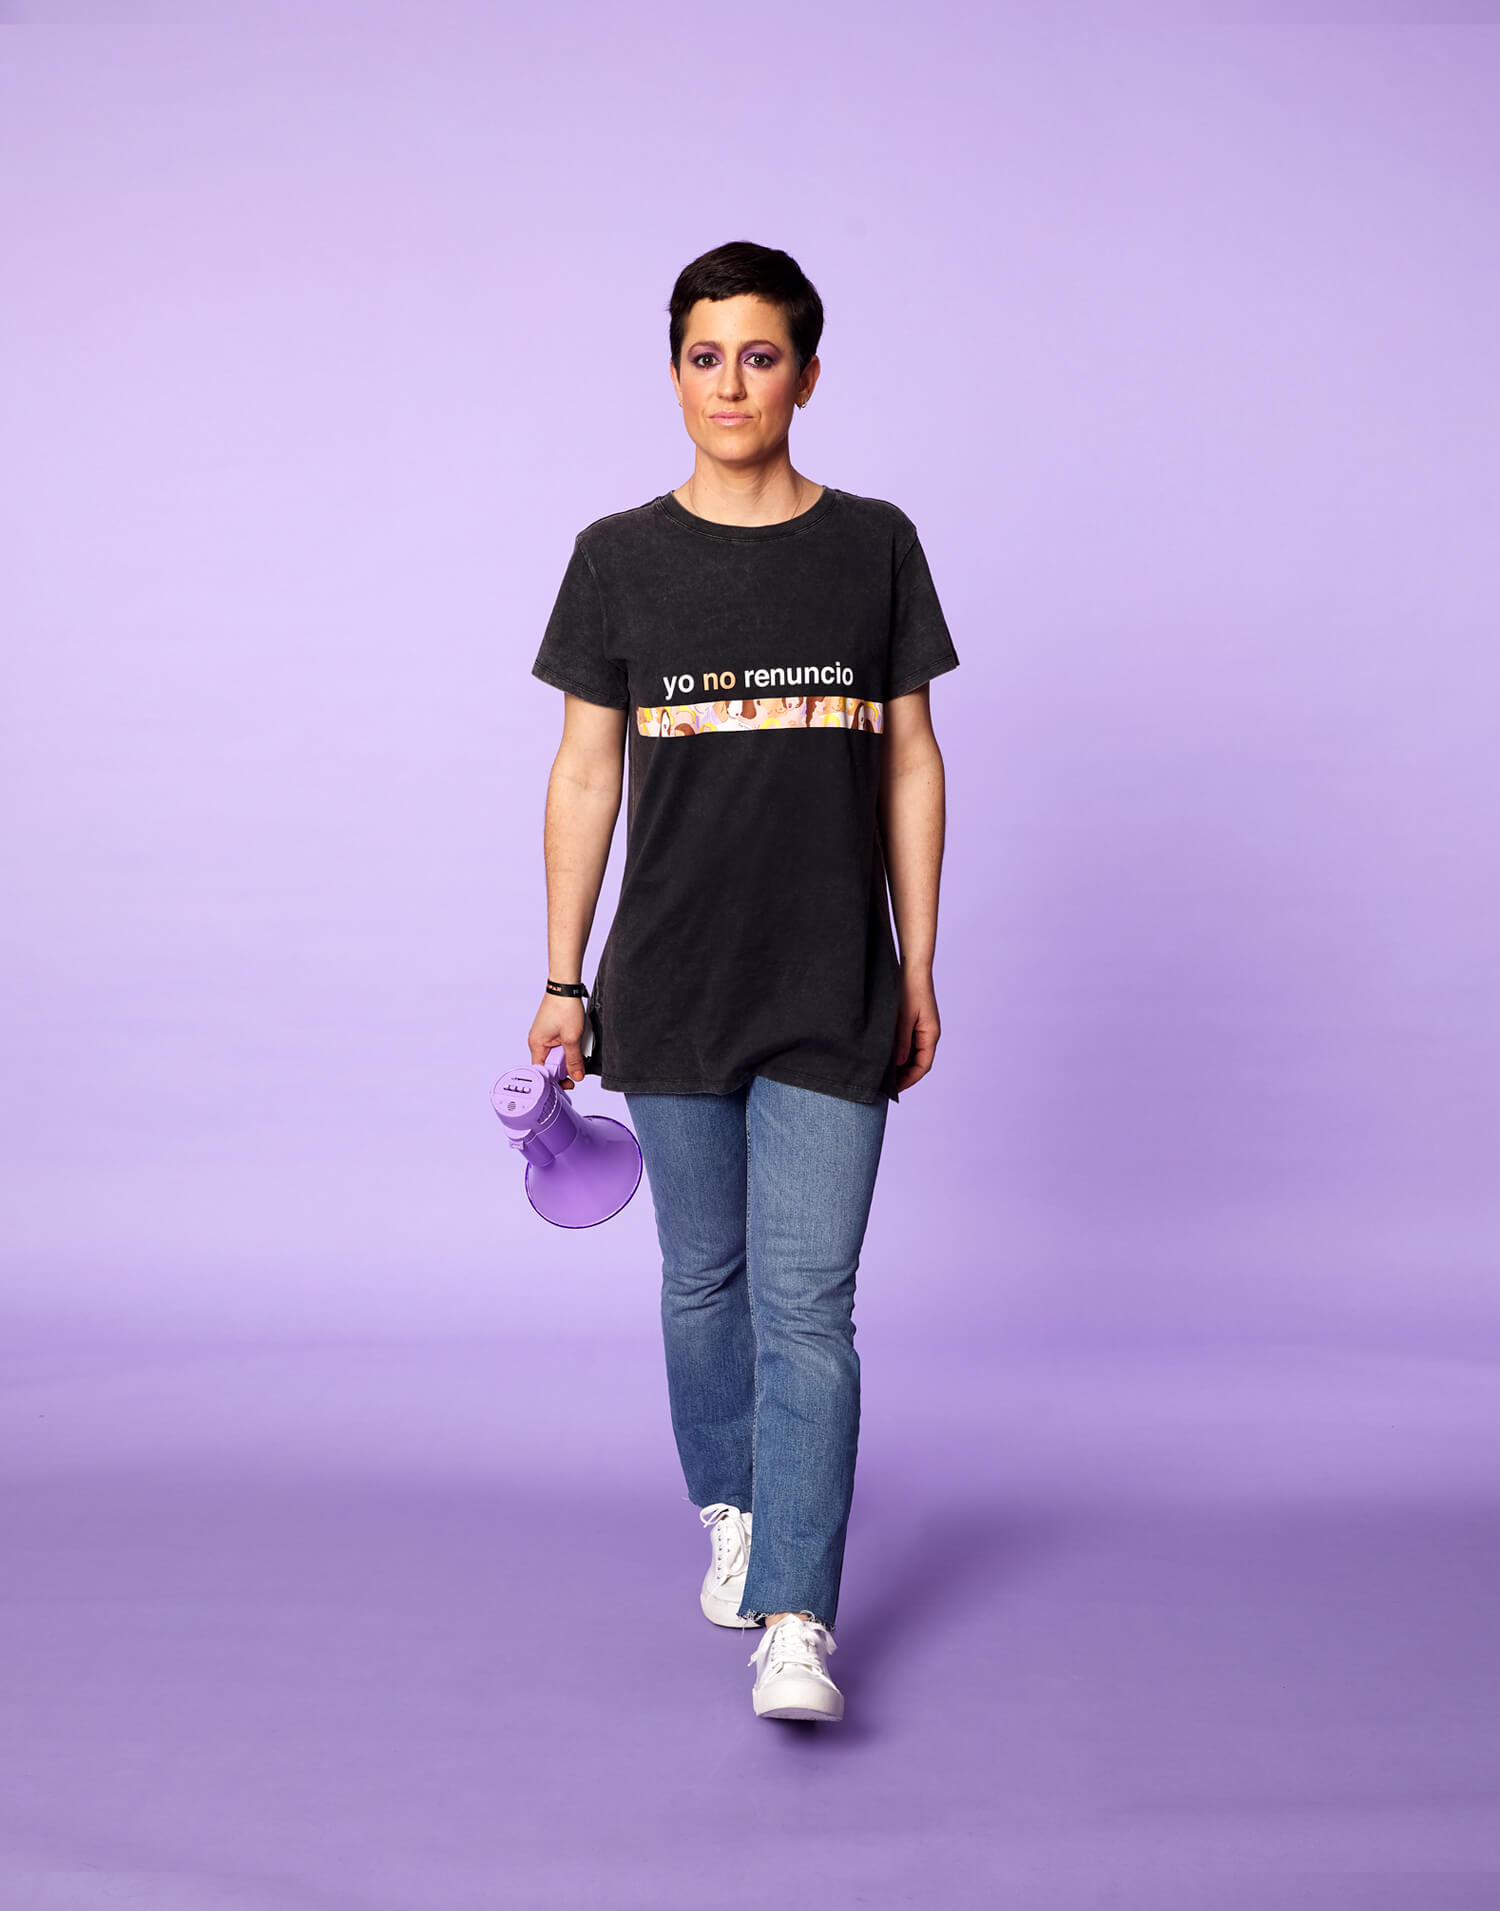 Camiseta Negra 'Yo no renuncio'